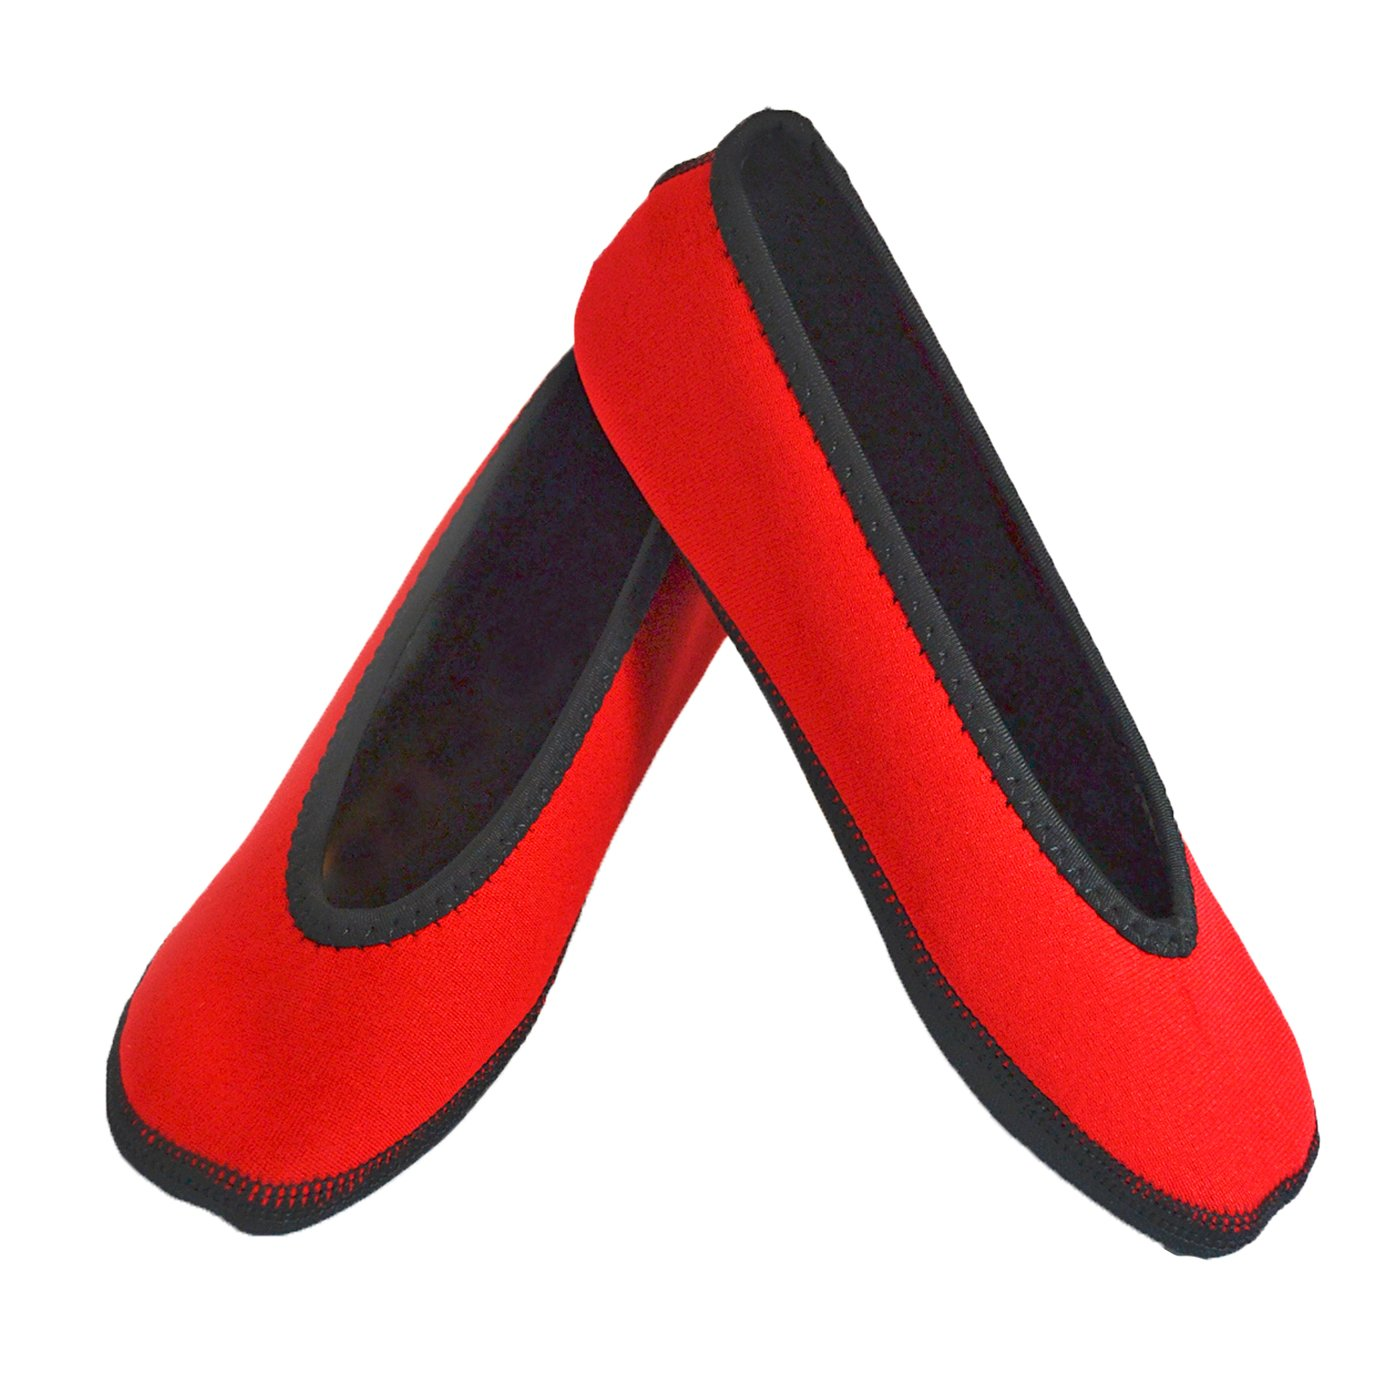 NuFoot Ballet Flats Women's Shoes, Foldable & Flexible Flats, Slipper Socks, Travel Slippers & Exercise Shoes, Dance Shoes, Yoga Socks, House Shoes, Indoor Slippers, Red, X-Large